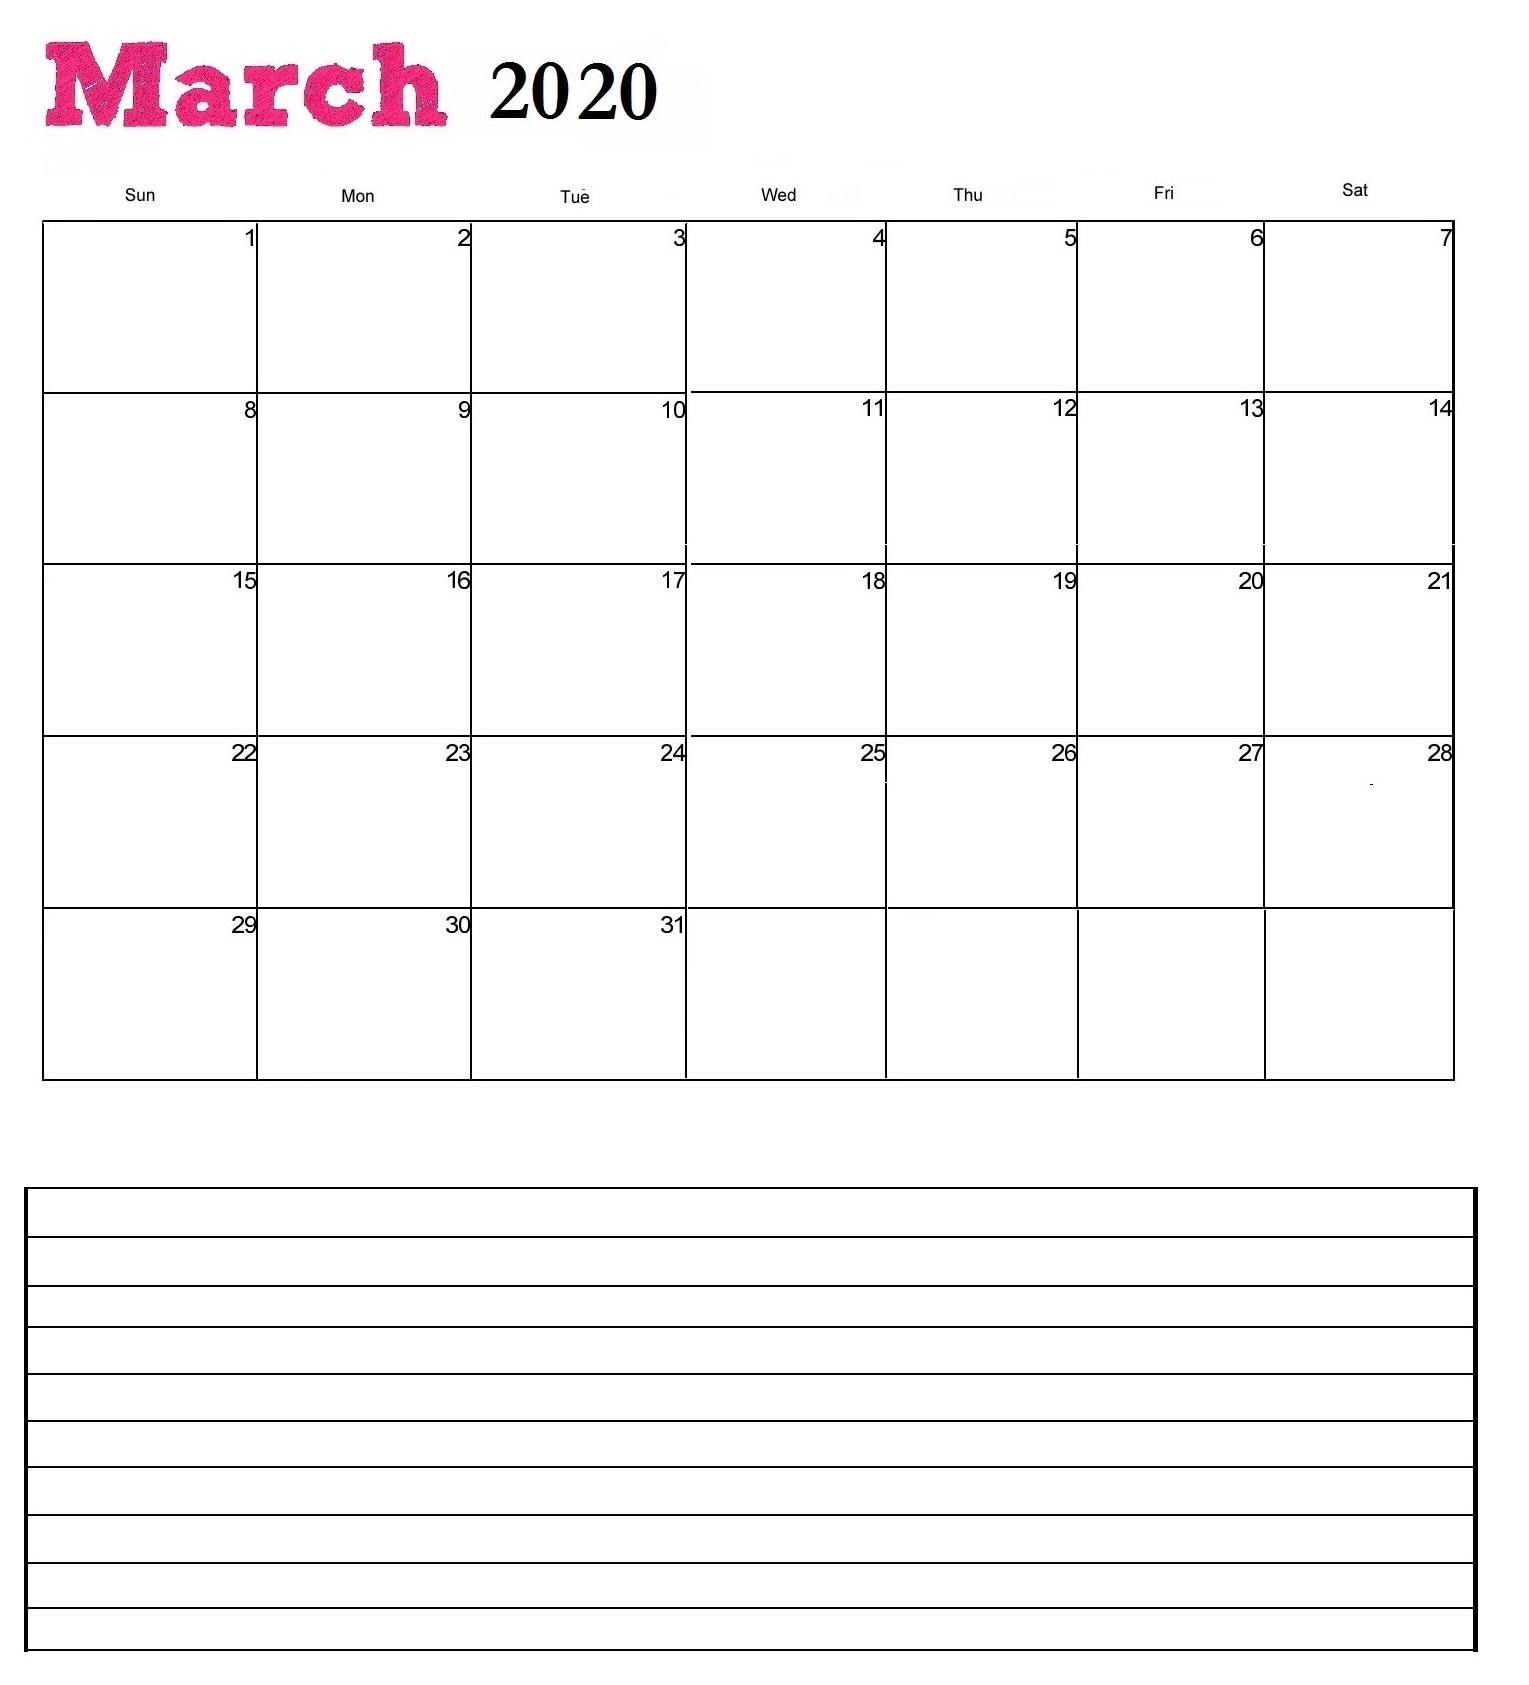 March 2020 Desk Calendar